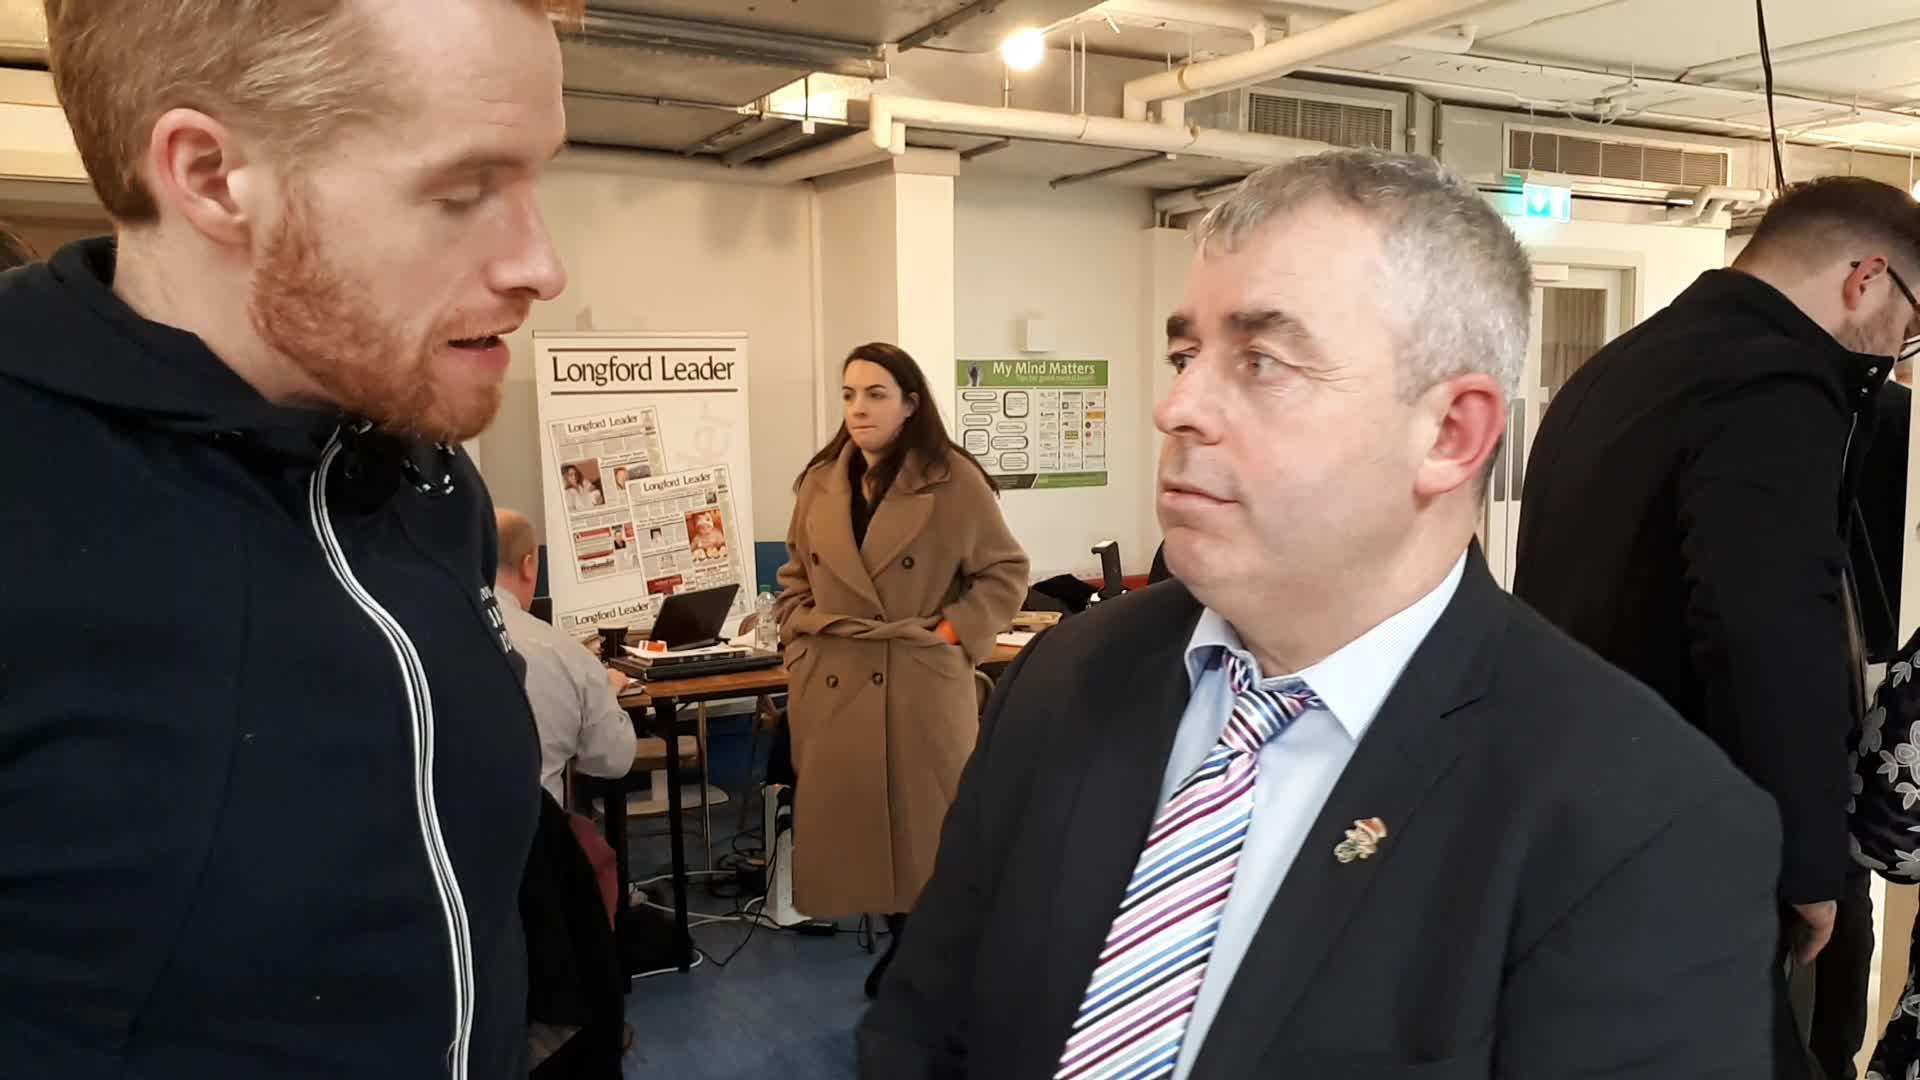 Trade Shows in Ireland,Trade Fairs in Ireland,Ireland Trade